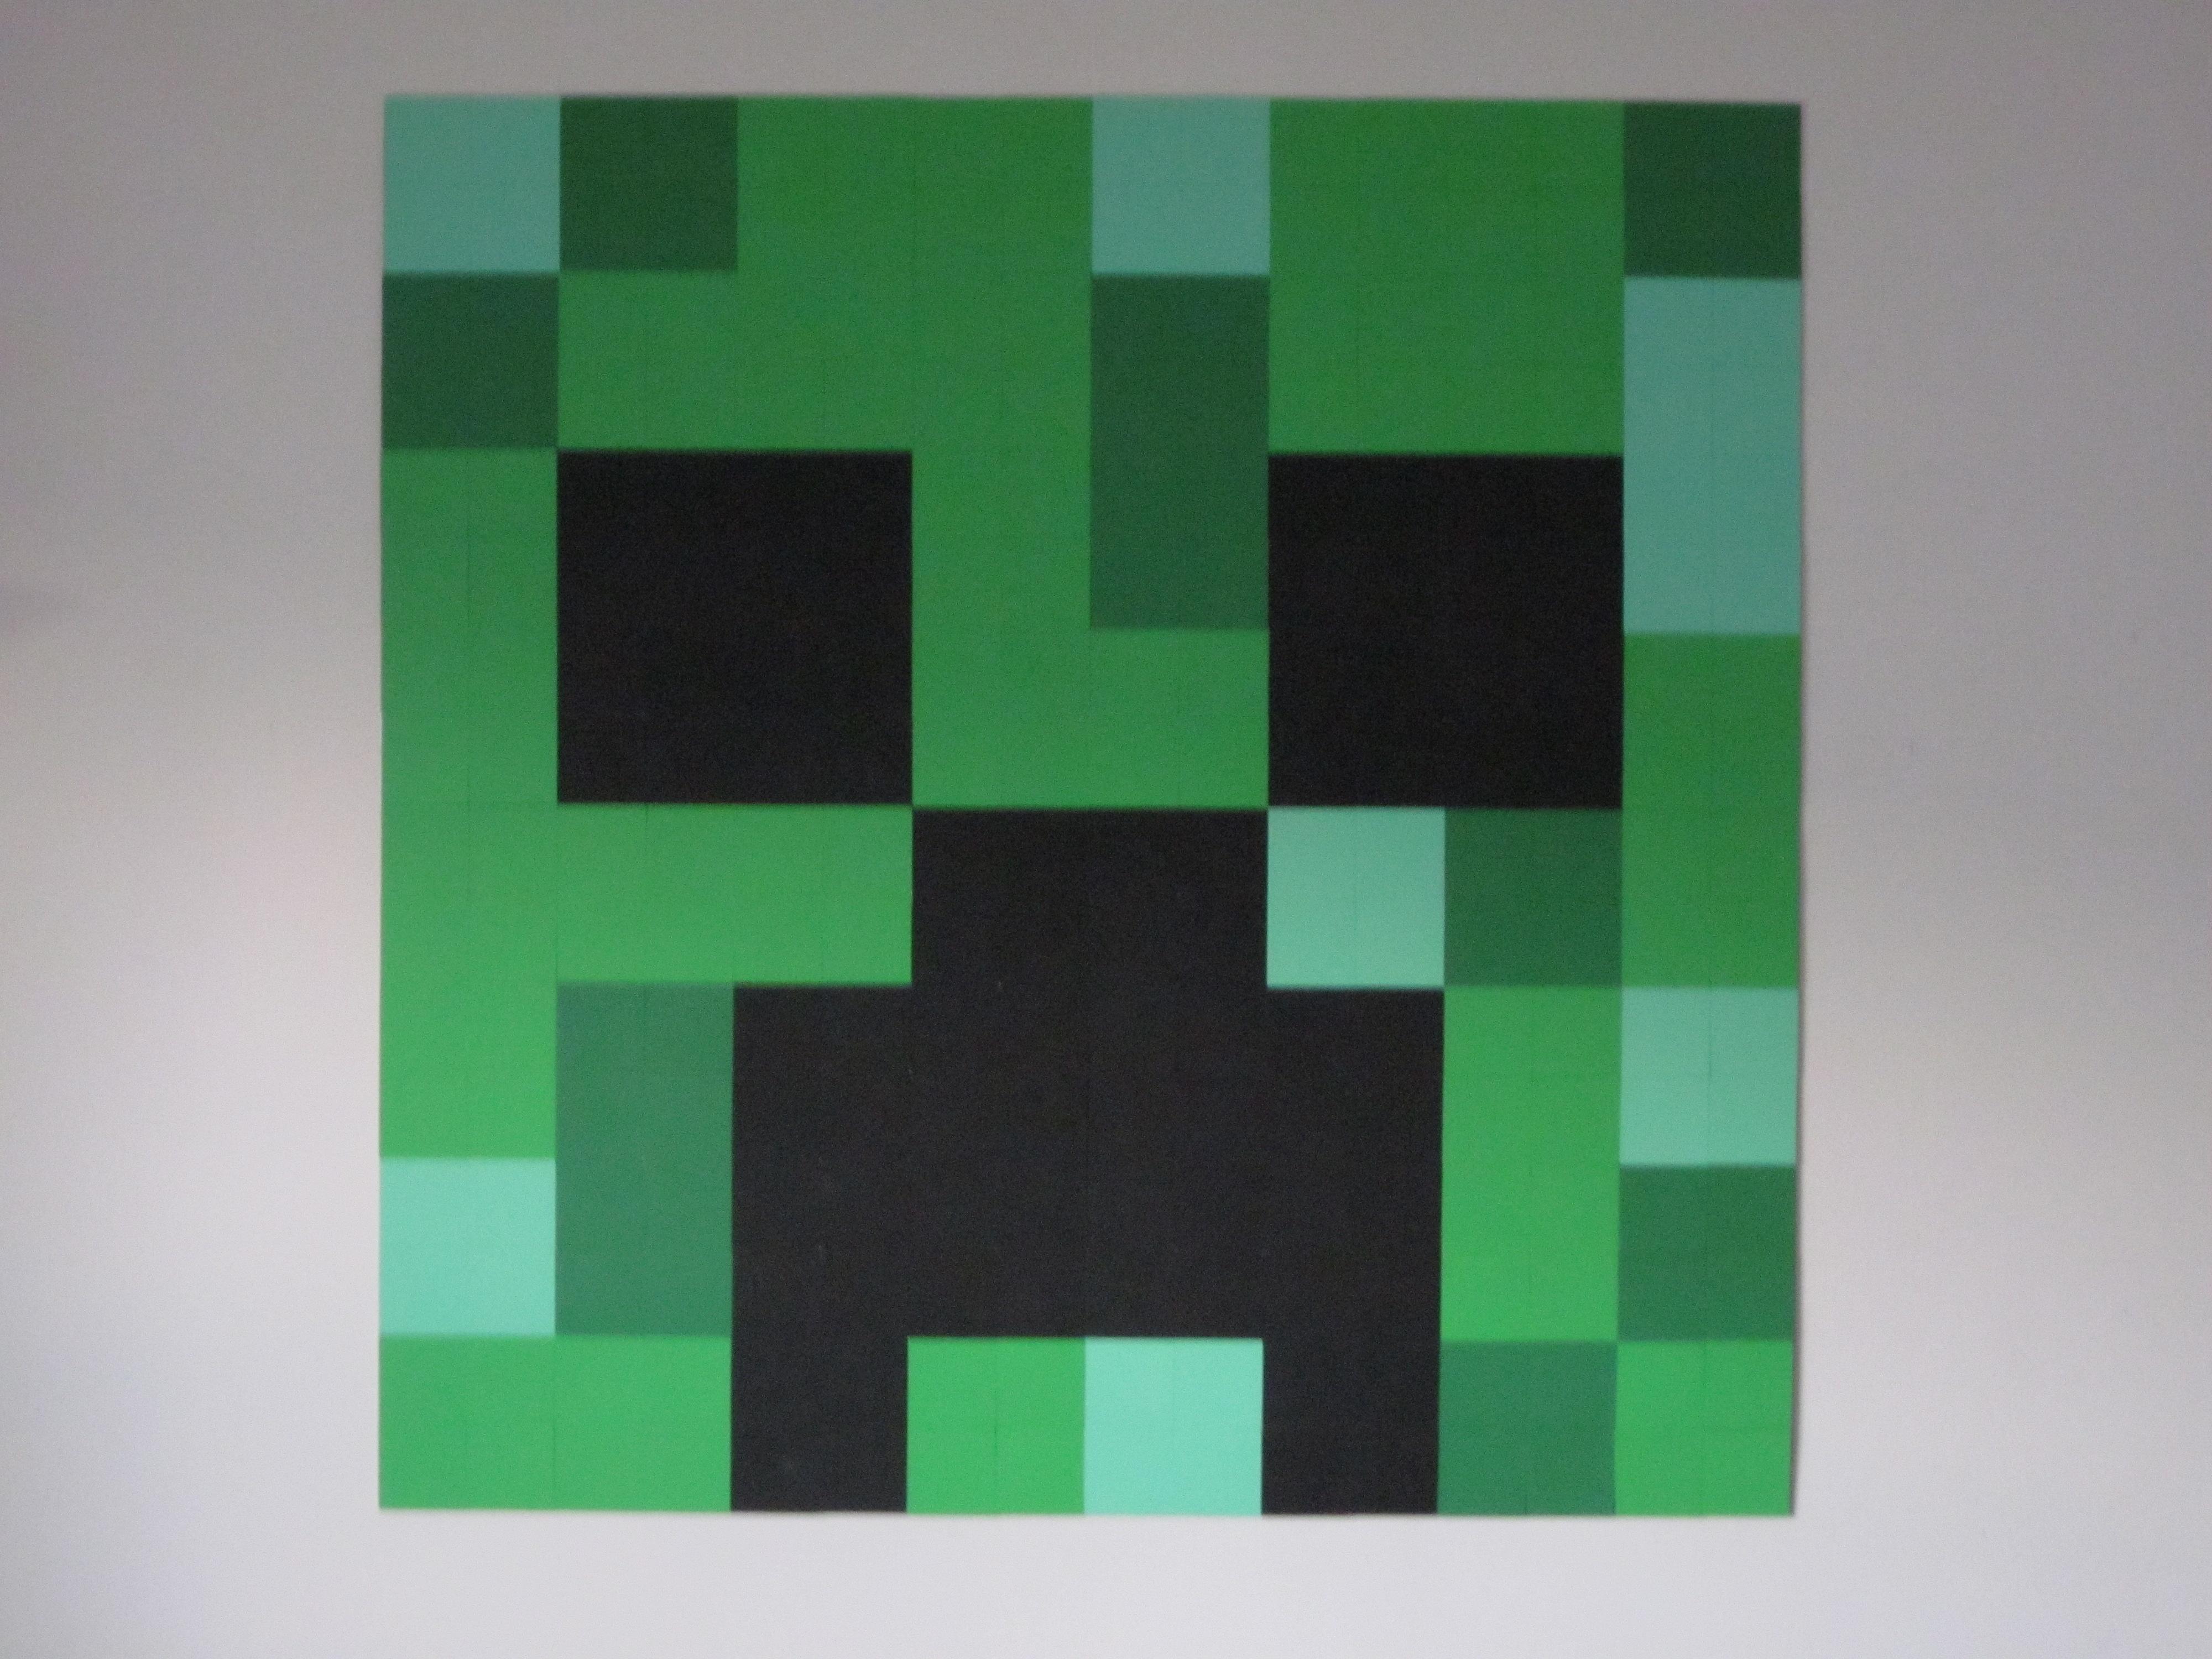 Herobrine Mod para Minecraft 1.5.2 | Descargar e Instalar